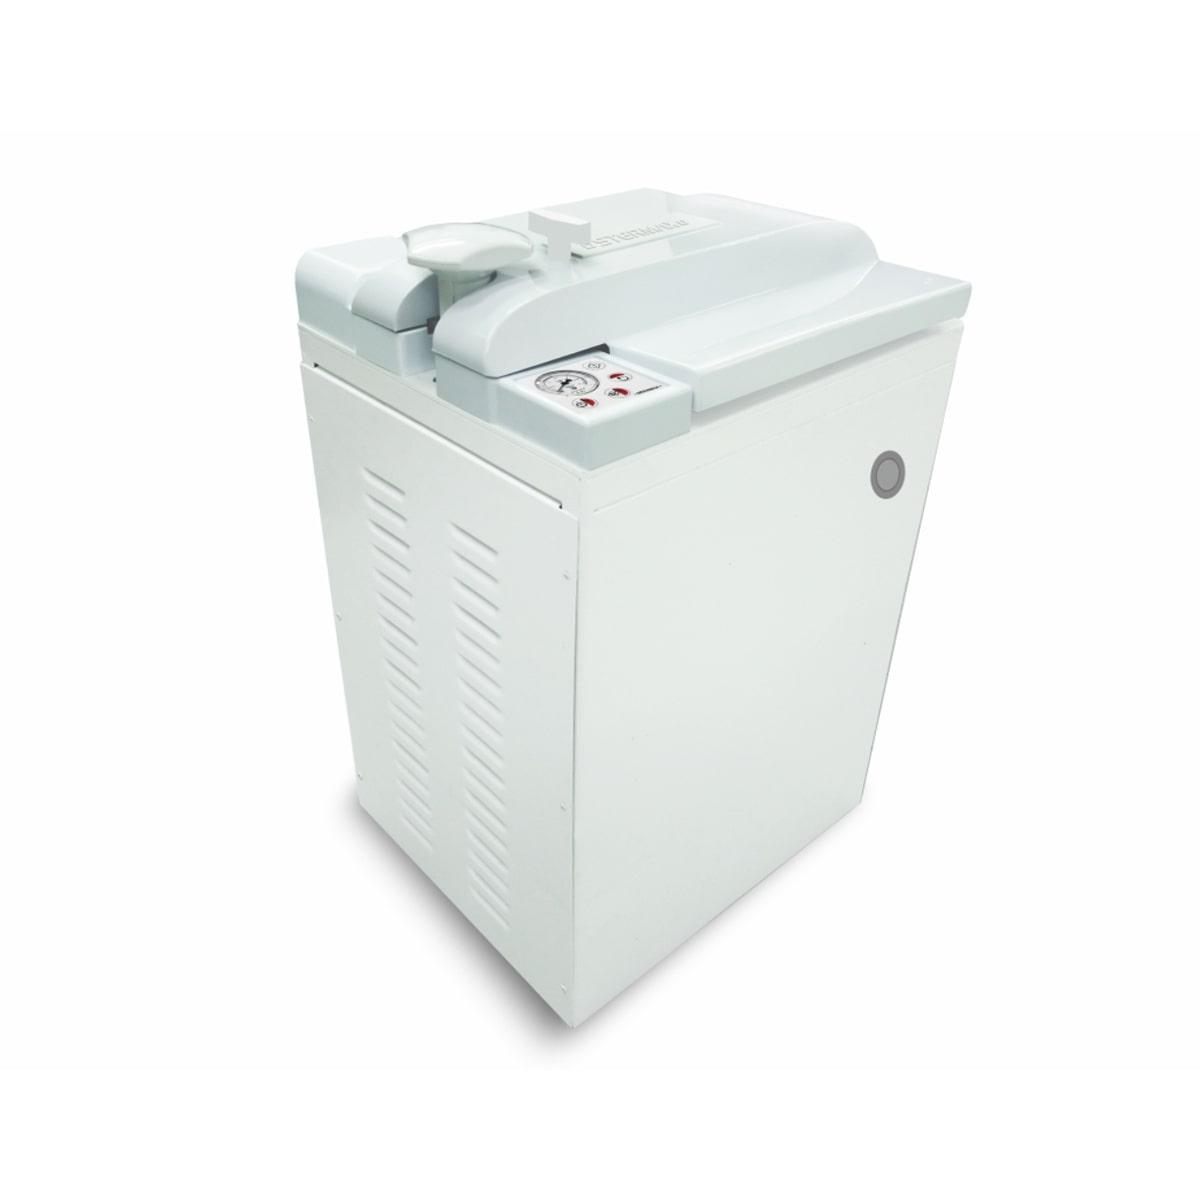 Autoclave Vertical Analógica Gravitacional Normal Box 40 litros  Stermax